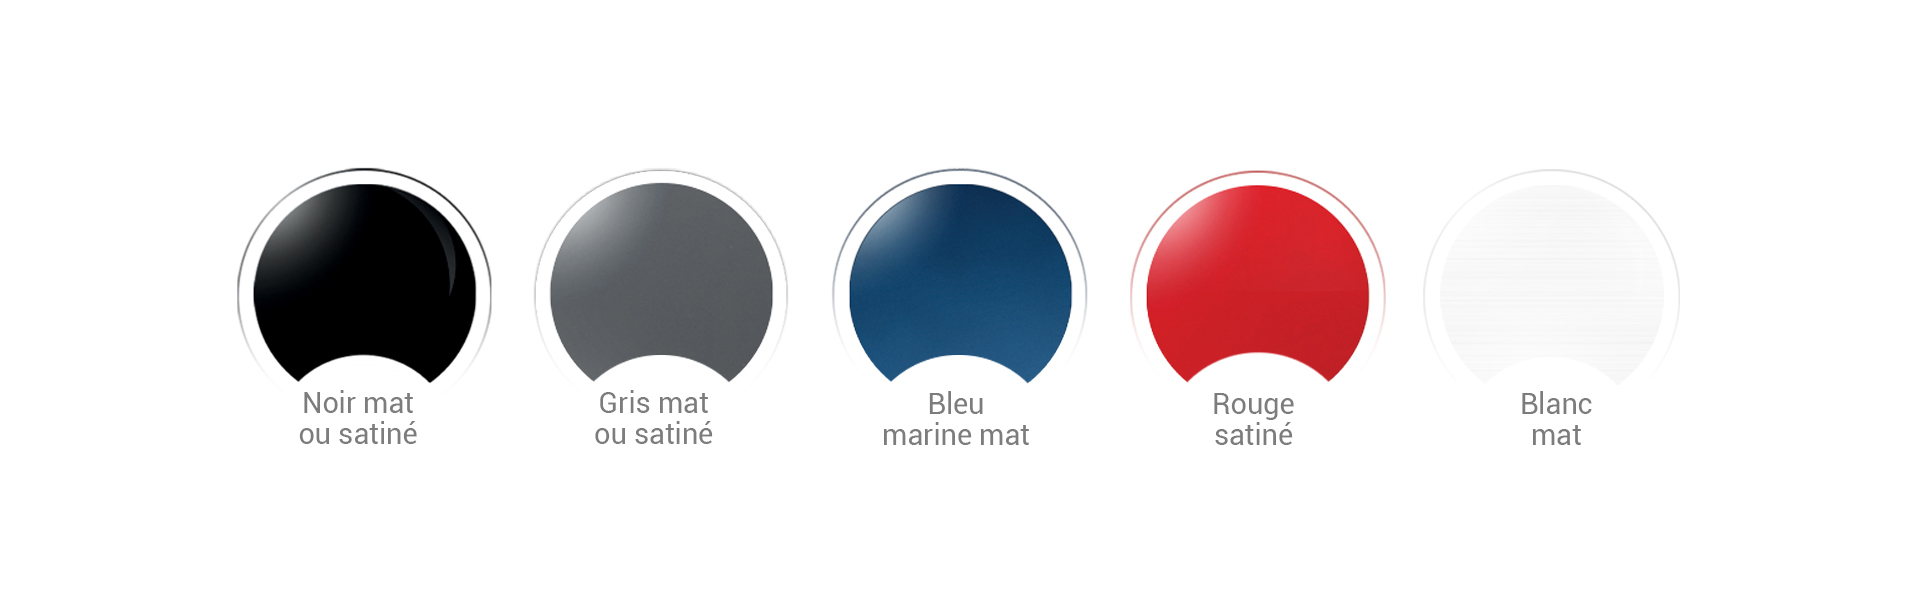 gamme-7-couleurs-tilscoot